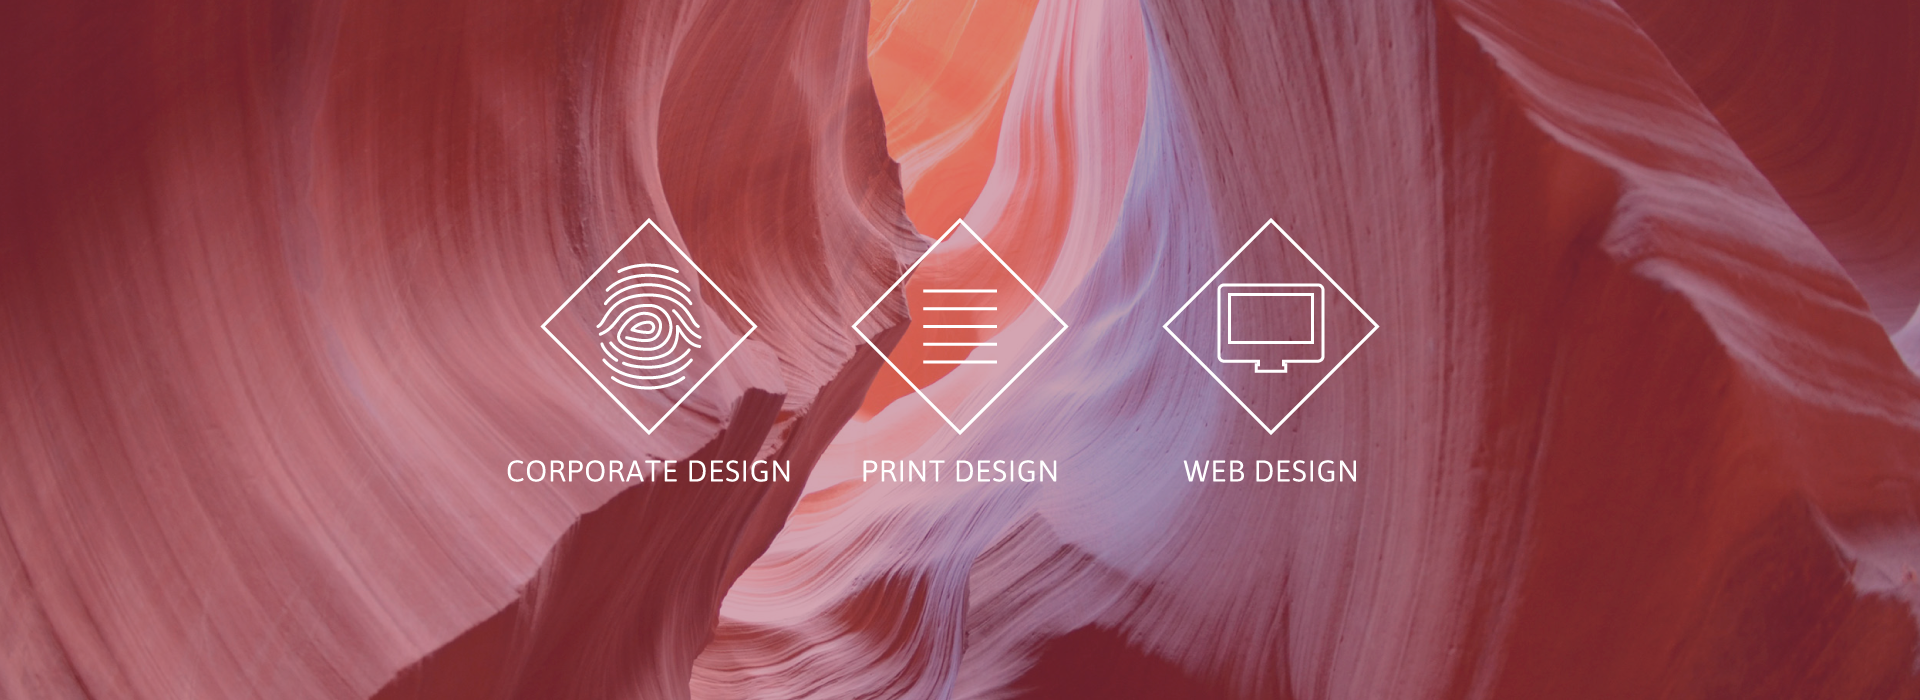 Corporate Design, Print Design, Web Design